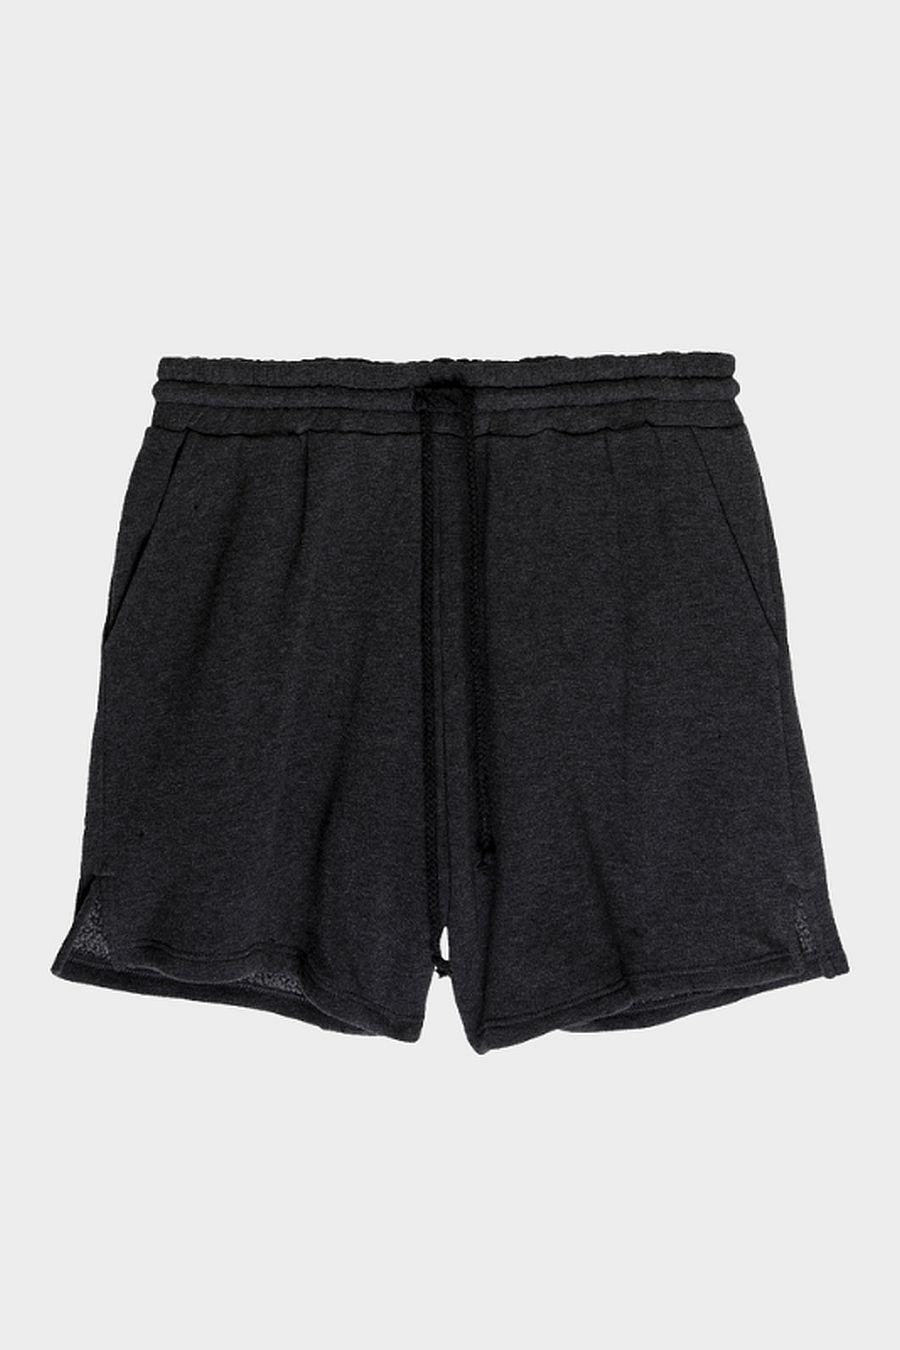 DONNI. Vintage Fleece Shorts - Charcoal